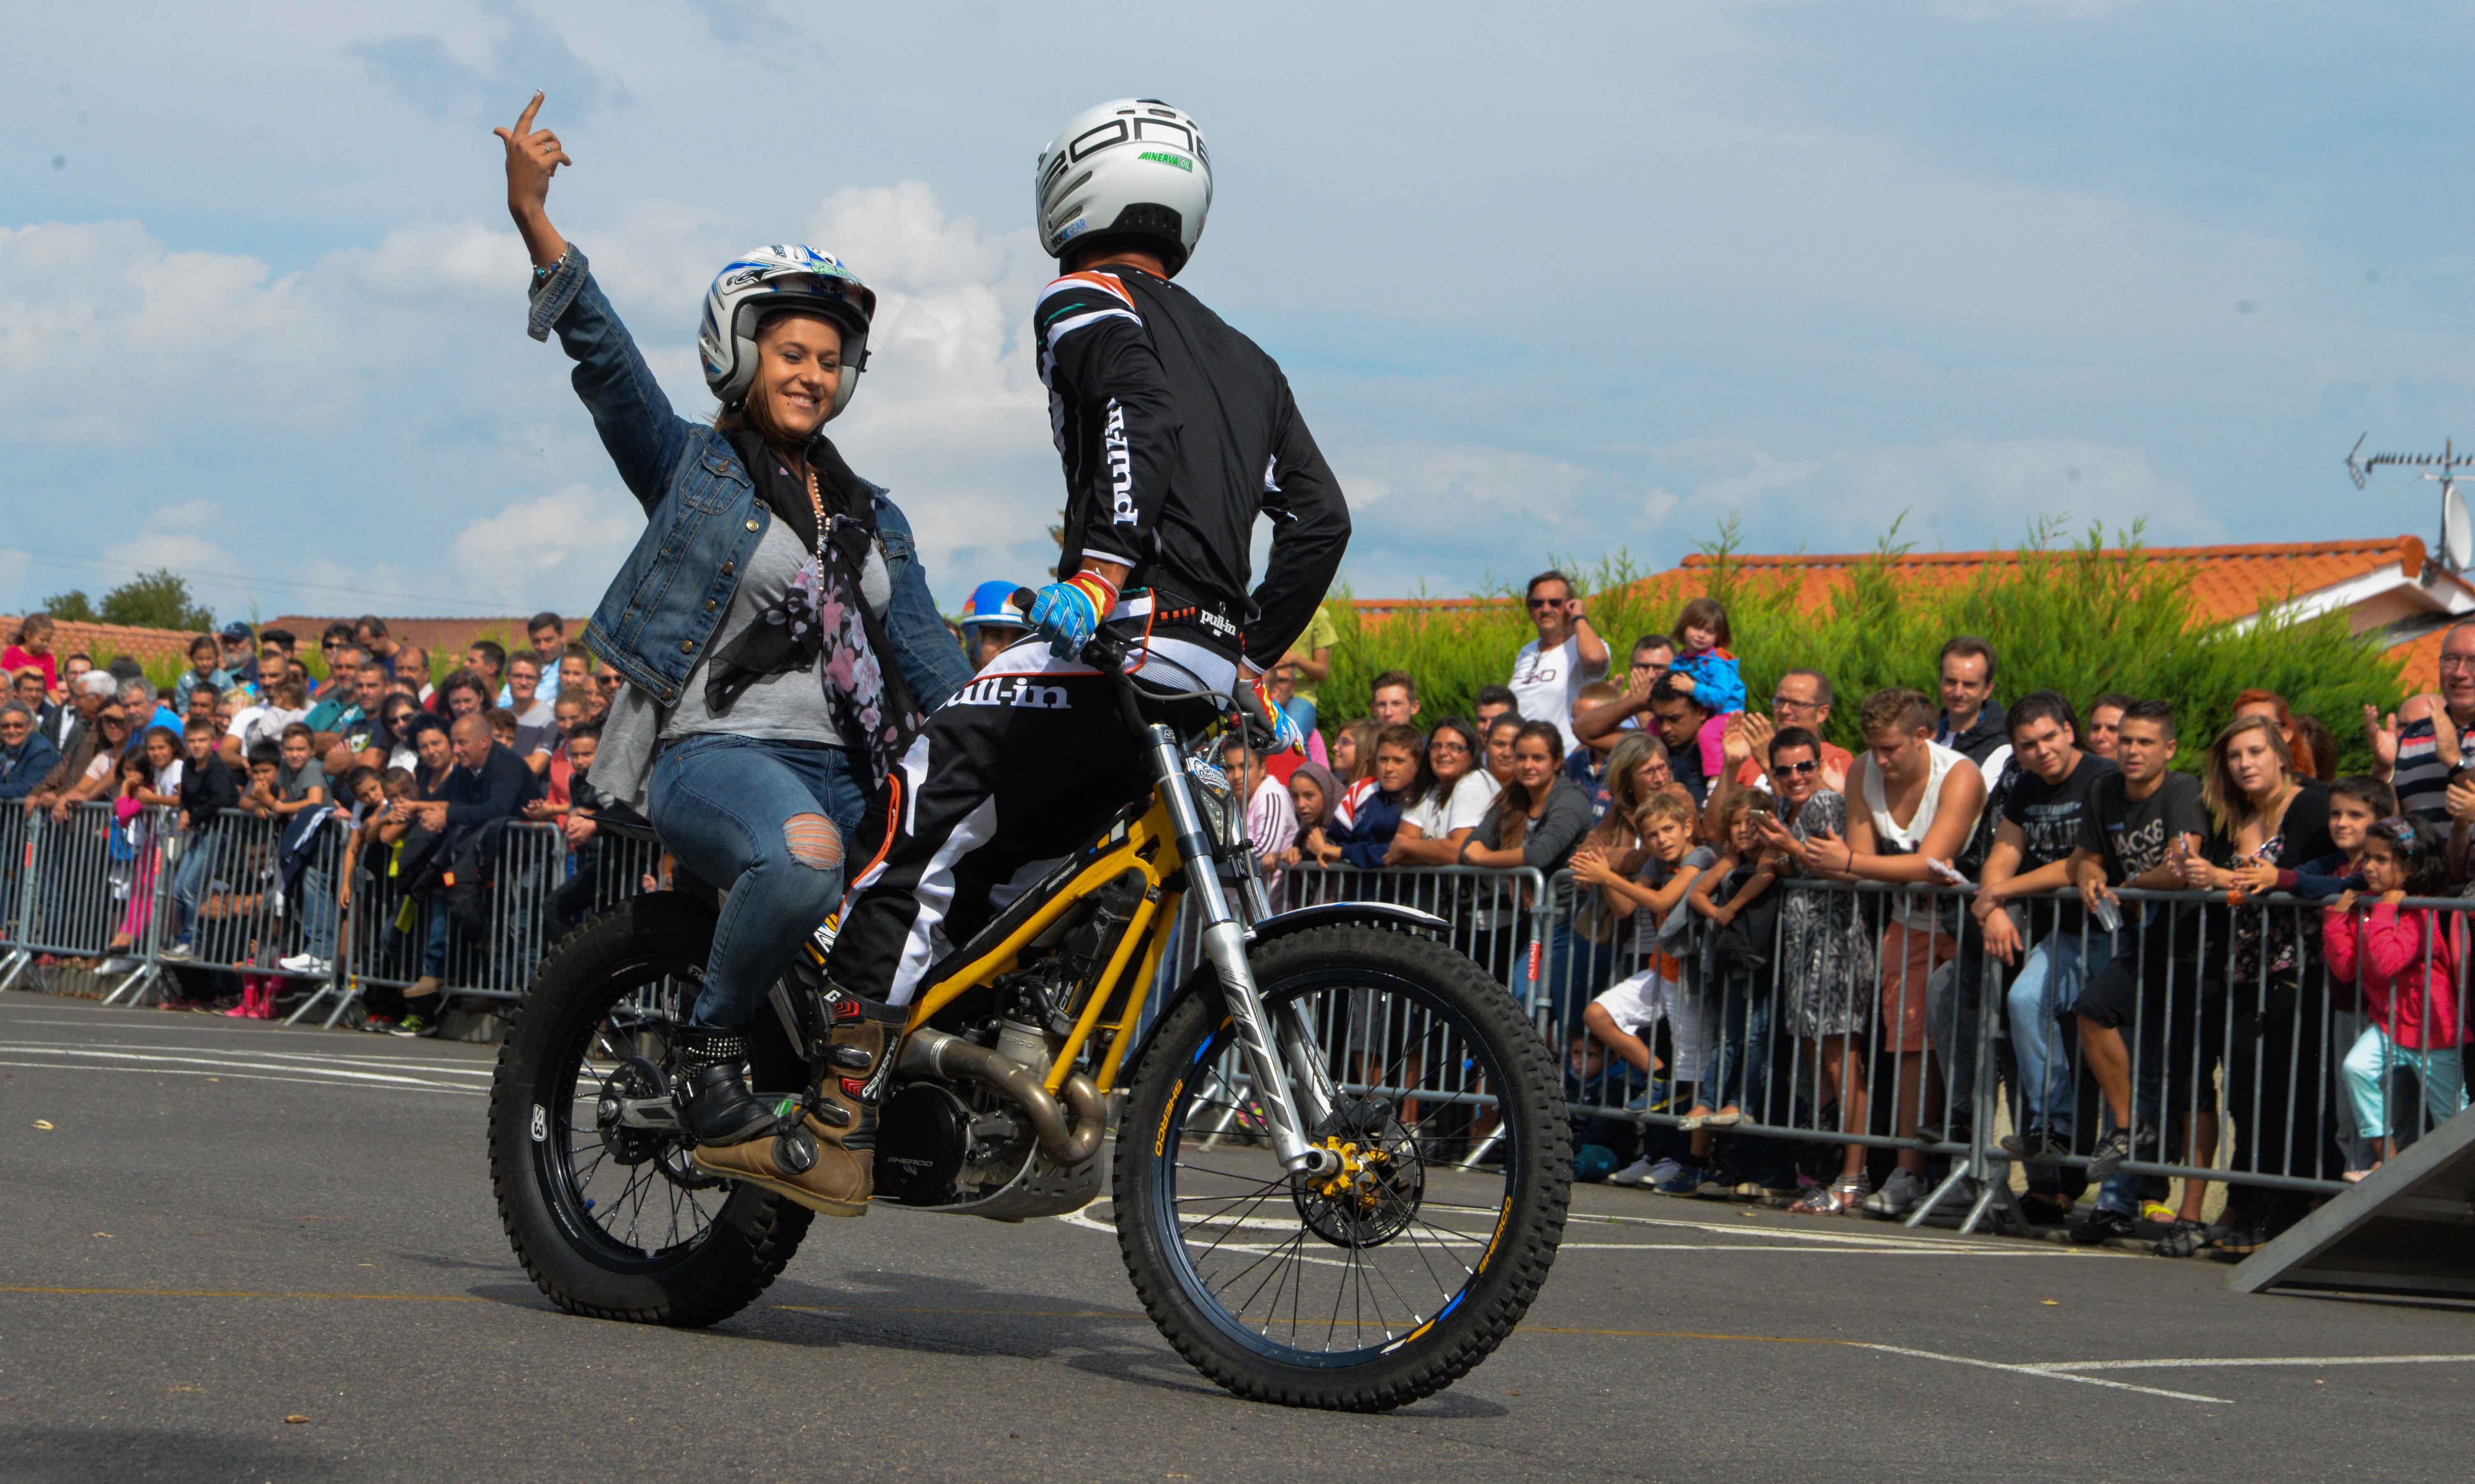 Spectacle acrobatie moto